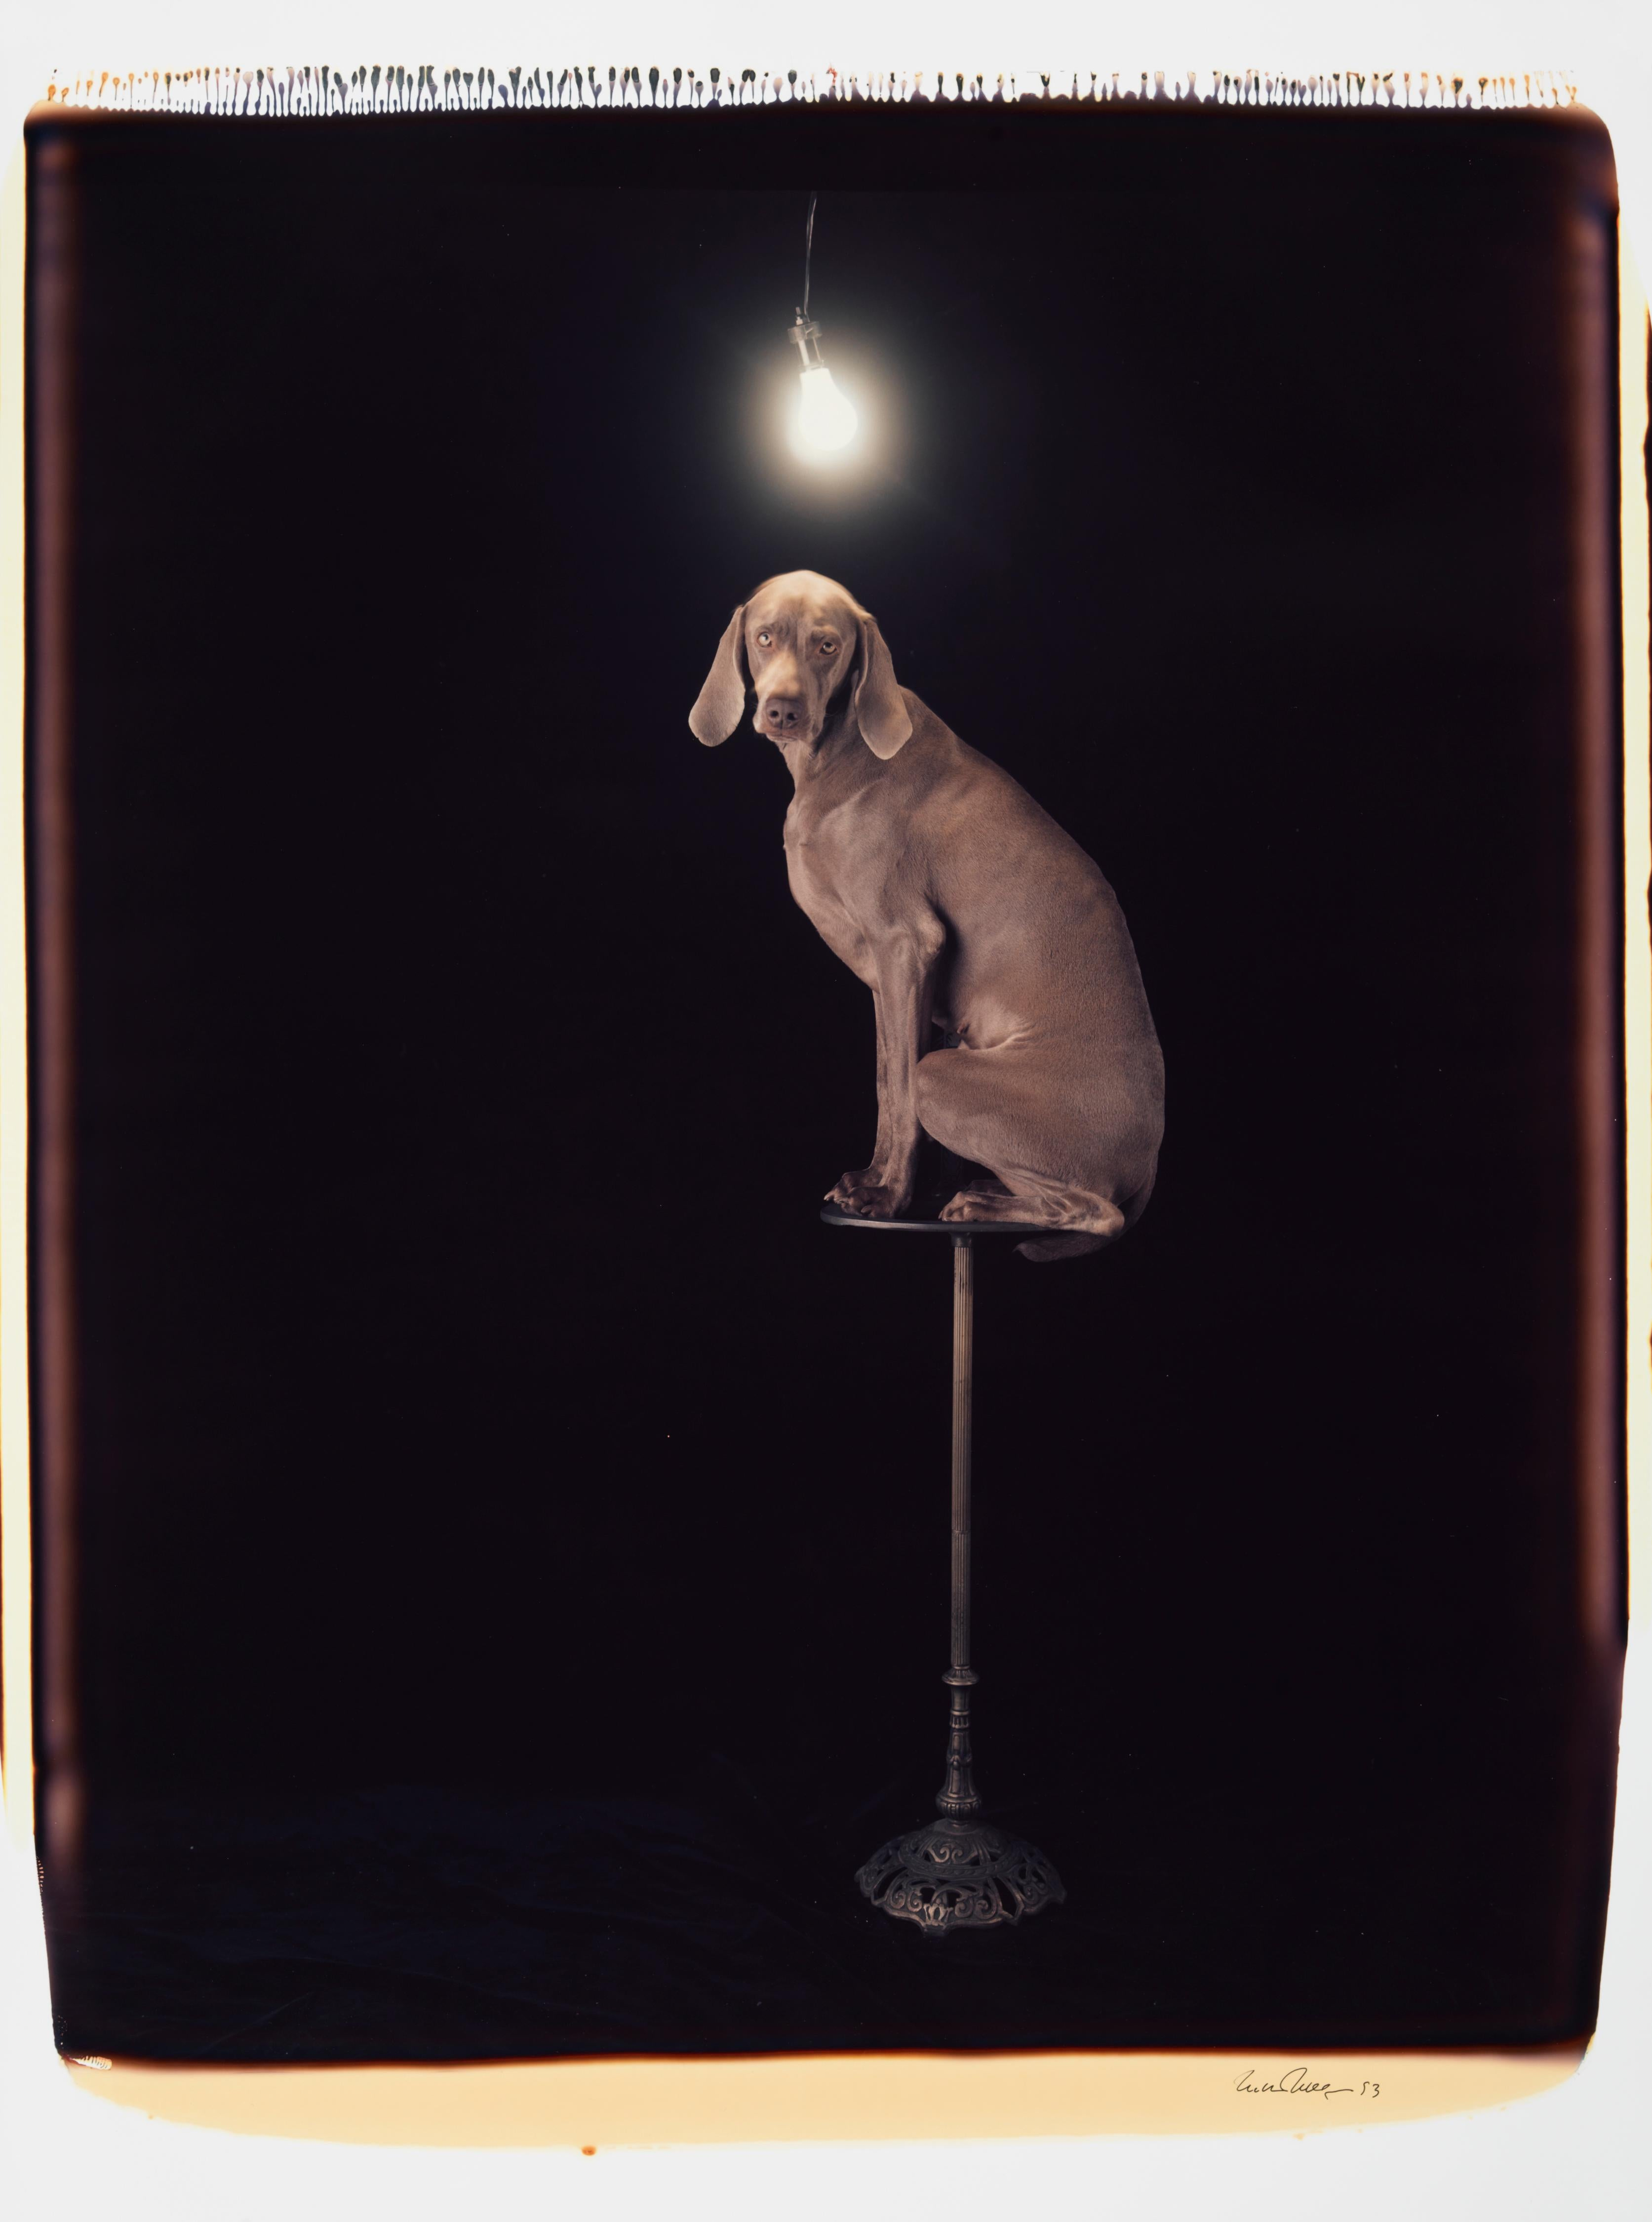 Illuminary - William Wegman (Colour Photography)